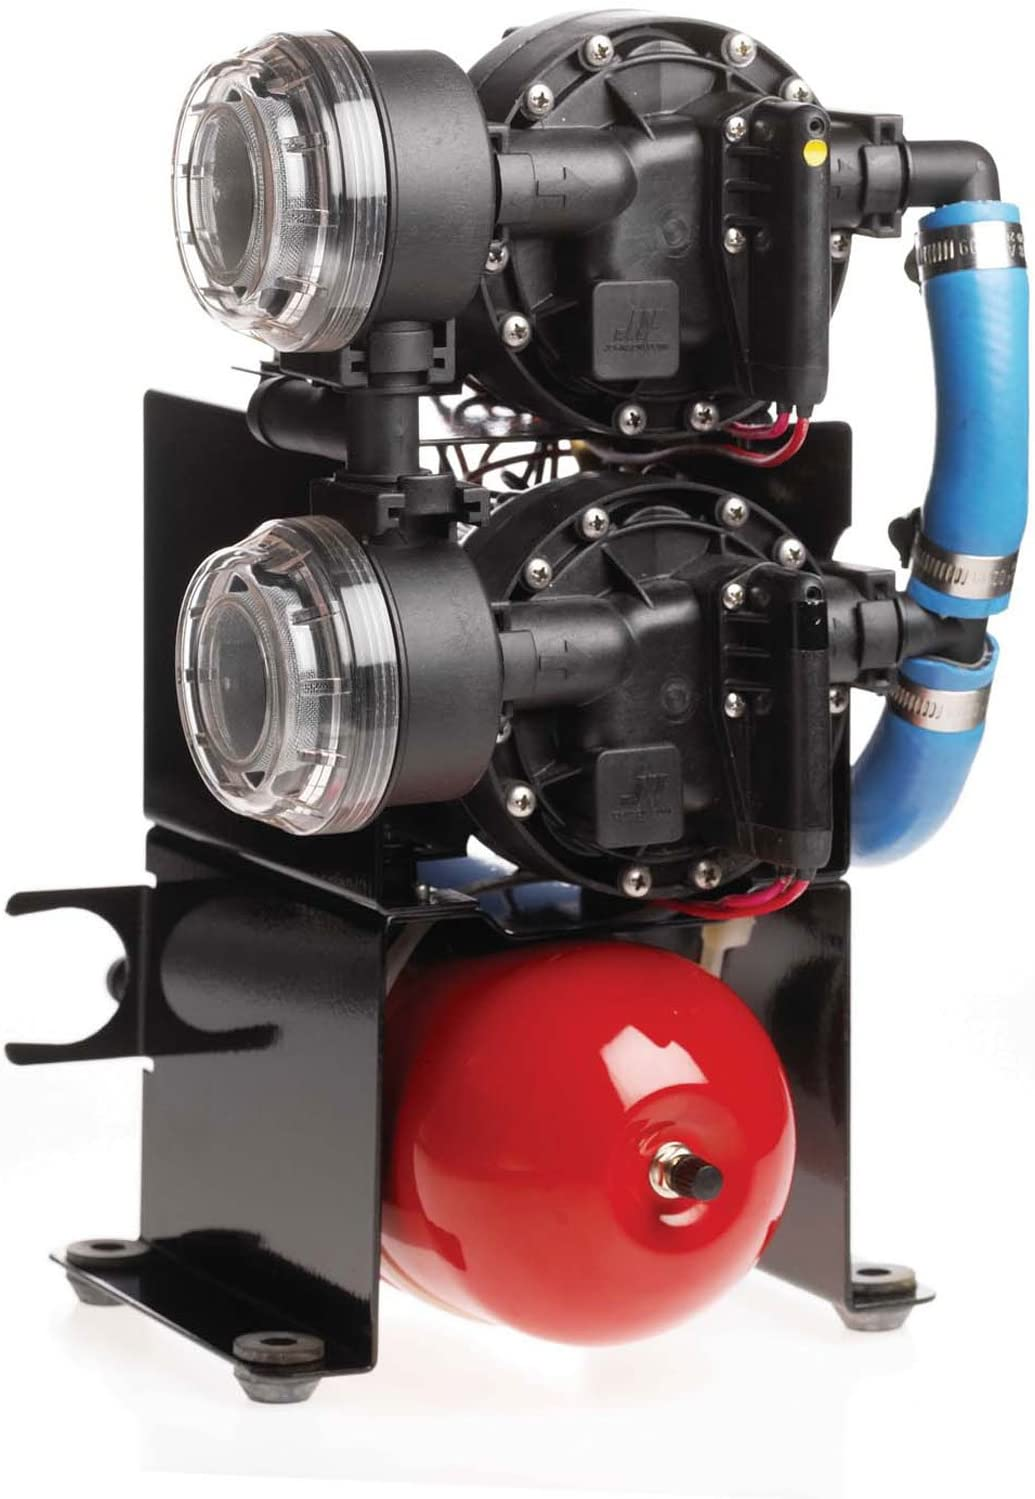 Johnson Pumps 10-13409-02 Aqua Jet Duo WPS 10.4 Water Pressure Pump System, 24V